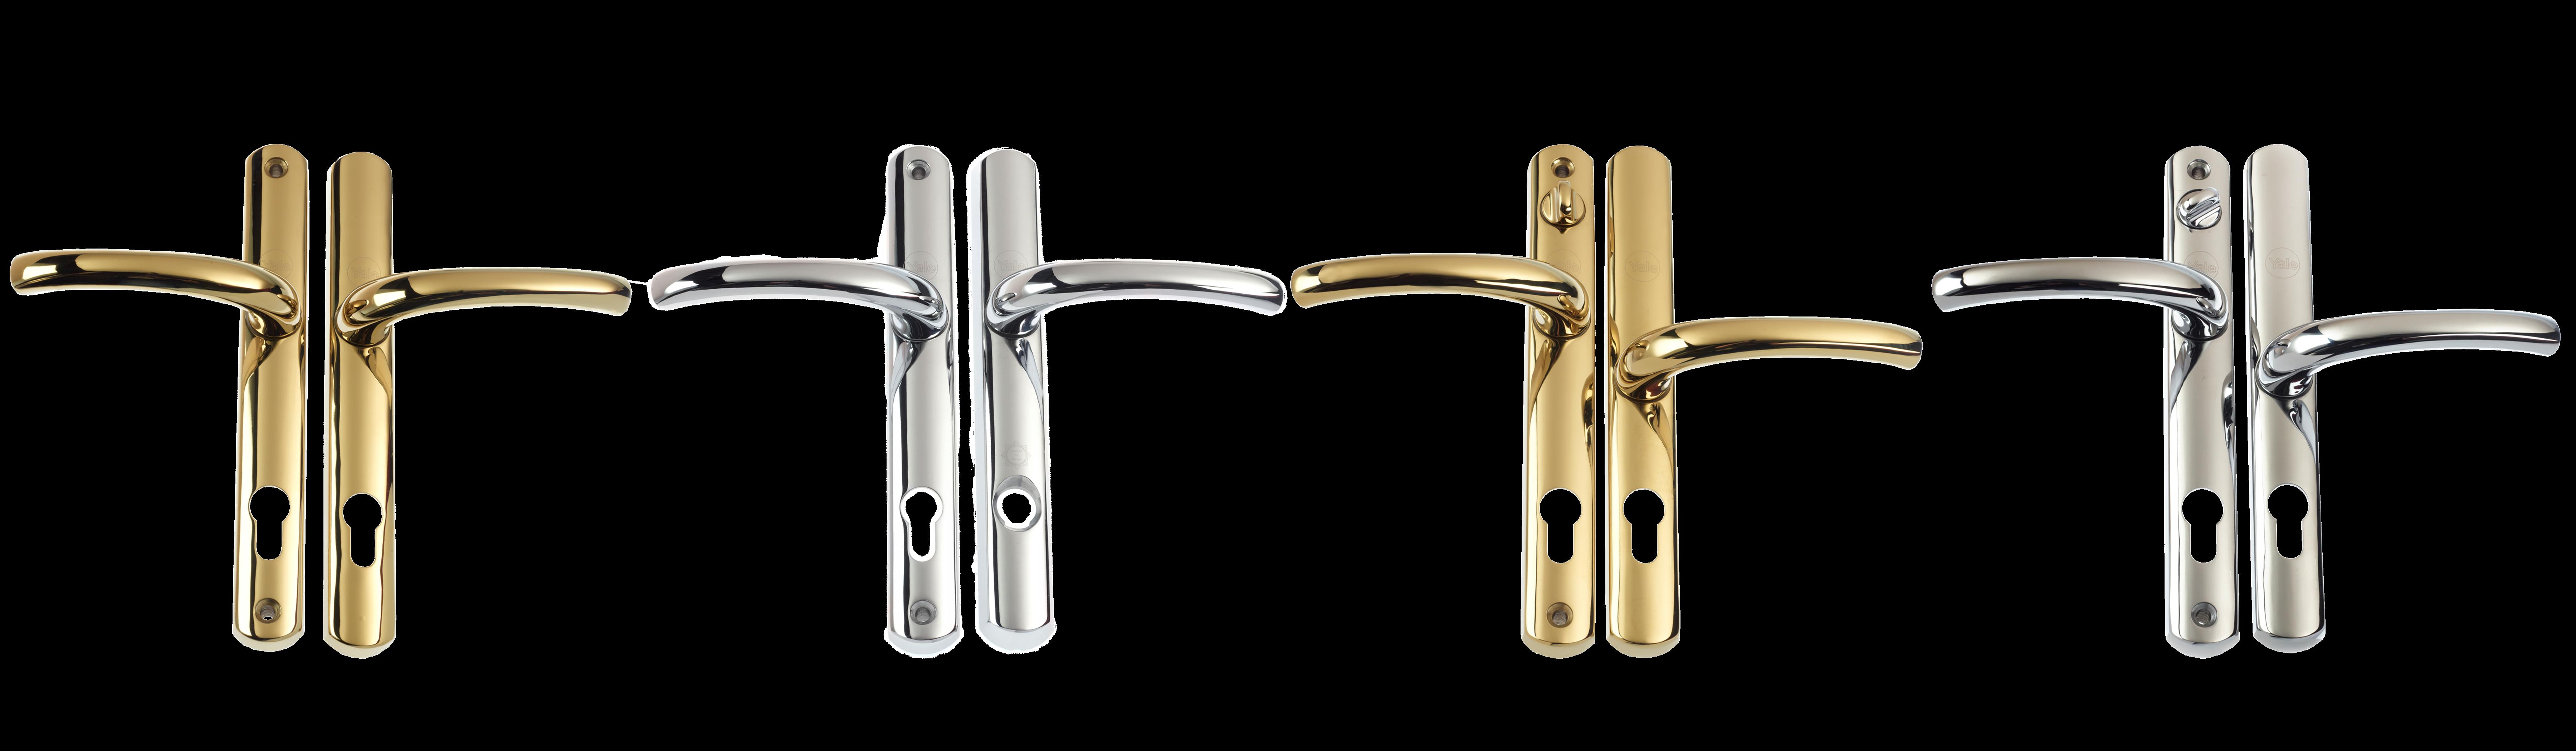 Yale Platinum Series Handle Sets